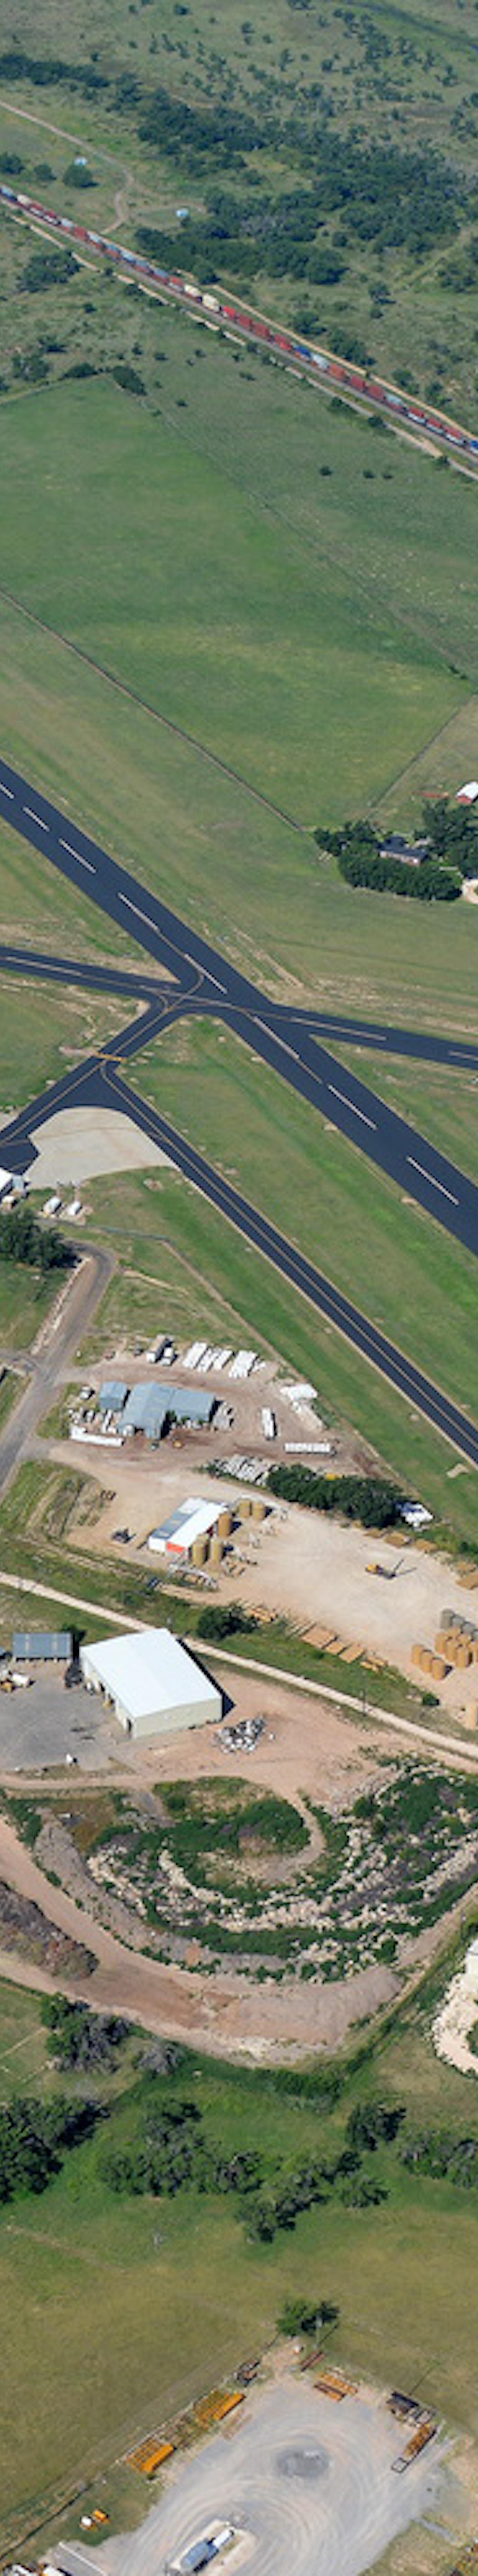 Hemphill County Airport Improvements